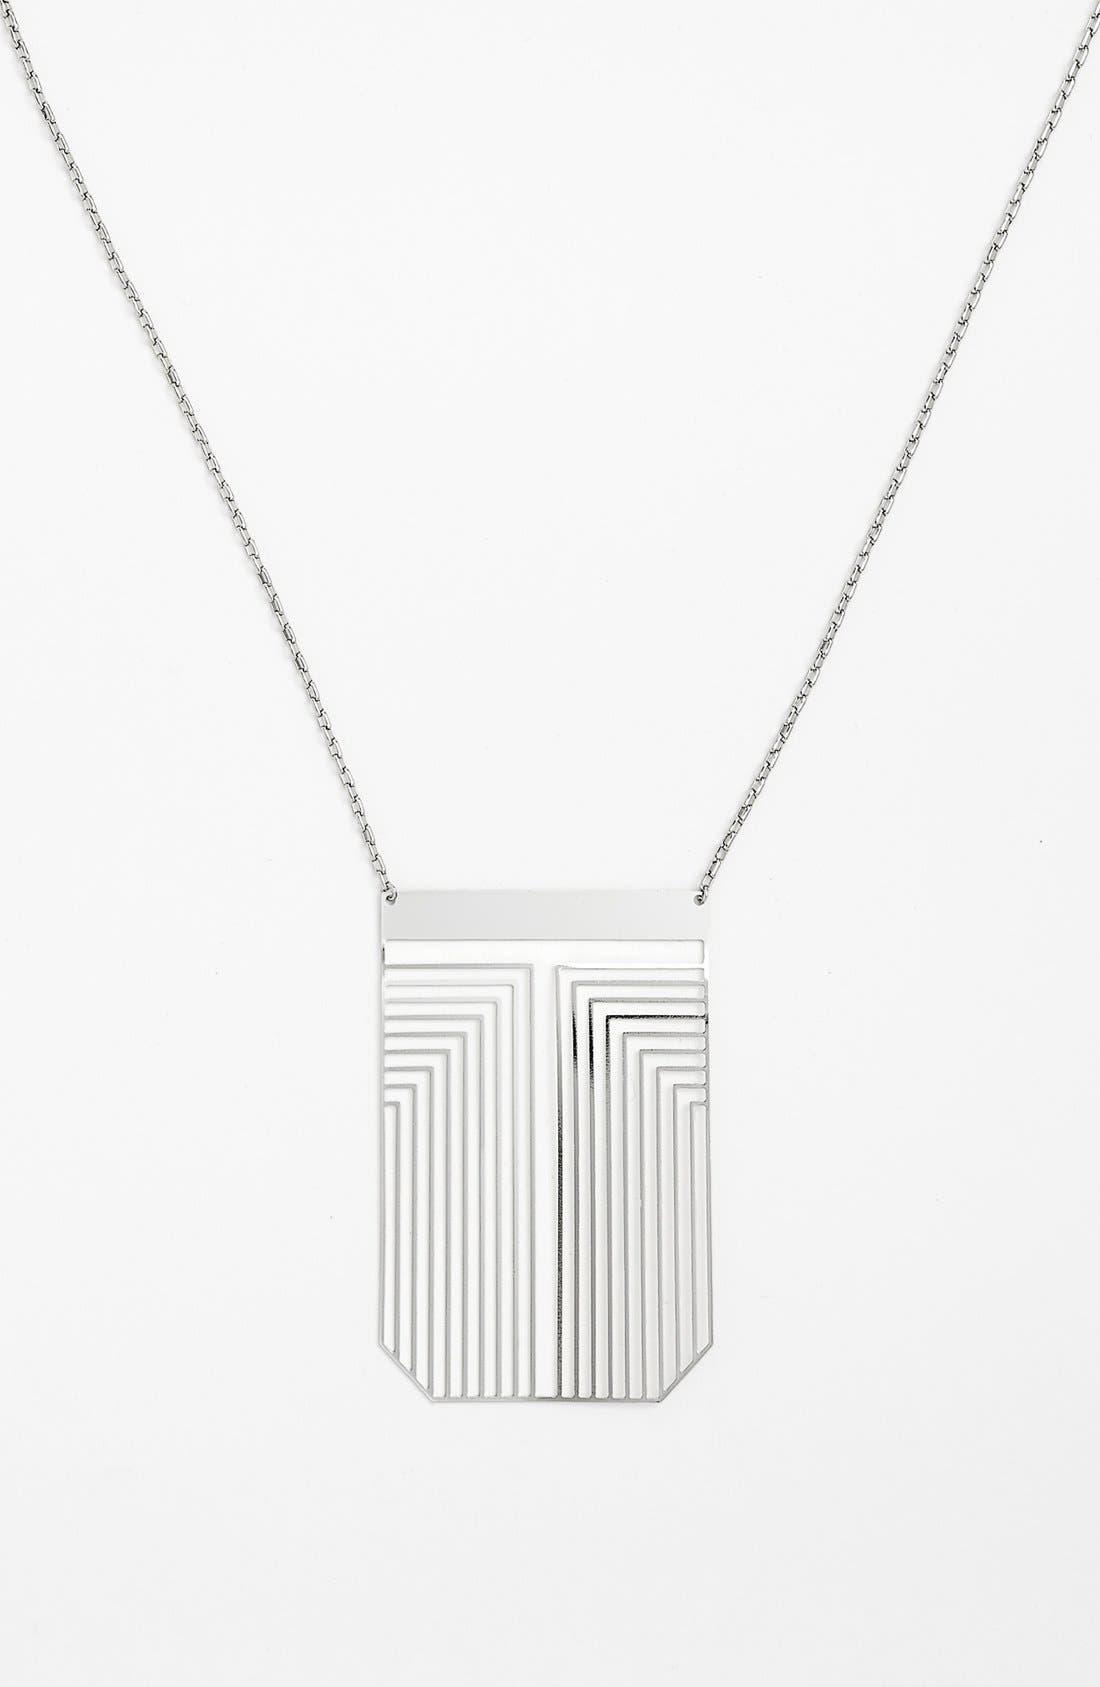 Main Image - Tory Burch 'Frete' Long Pendant Necklace